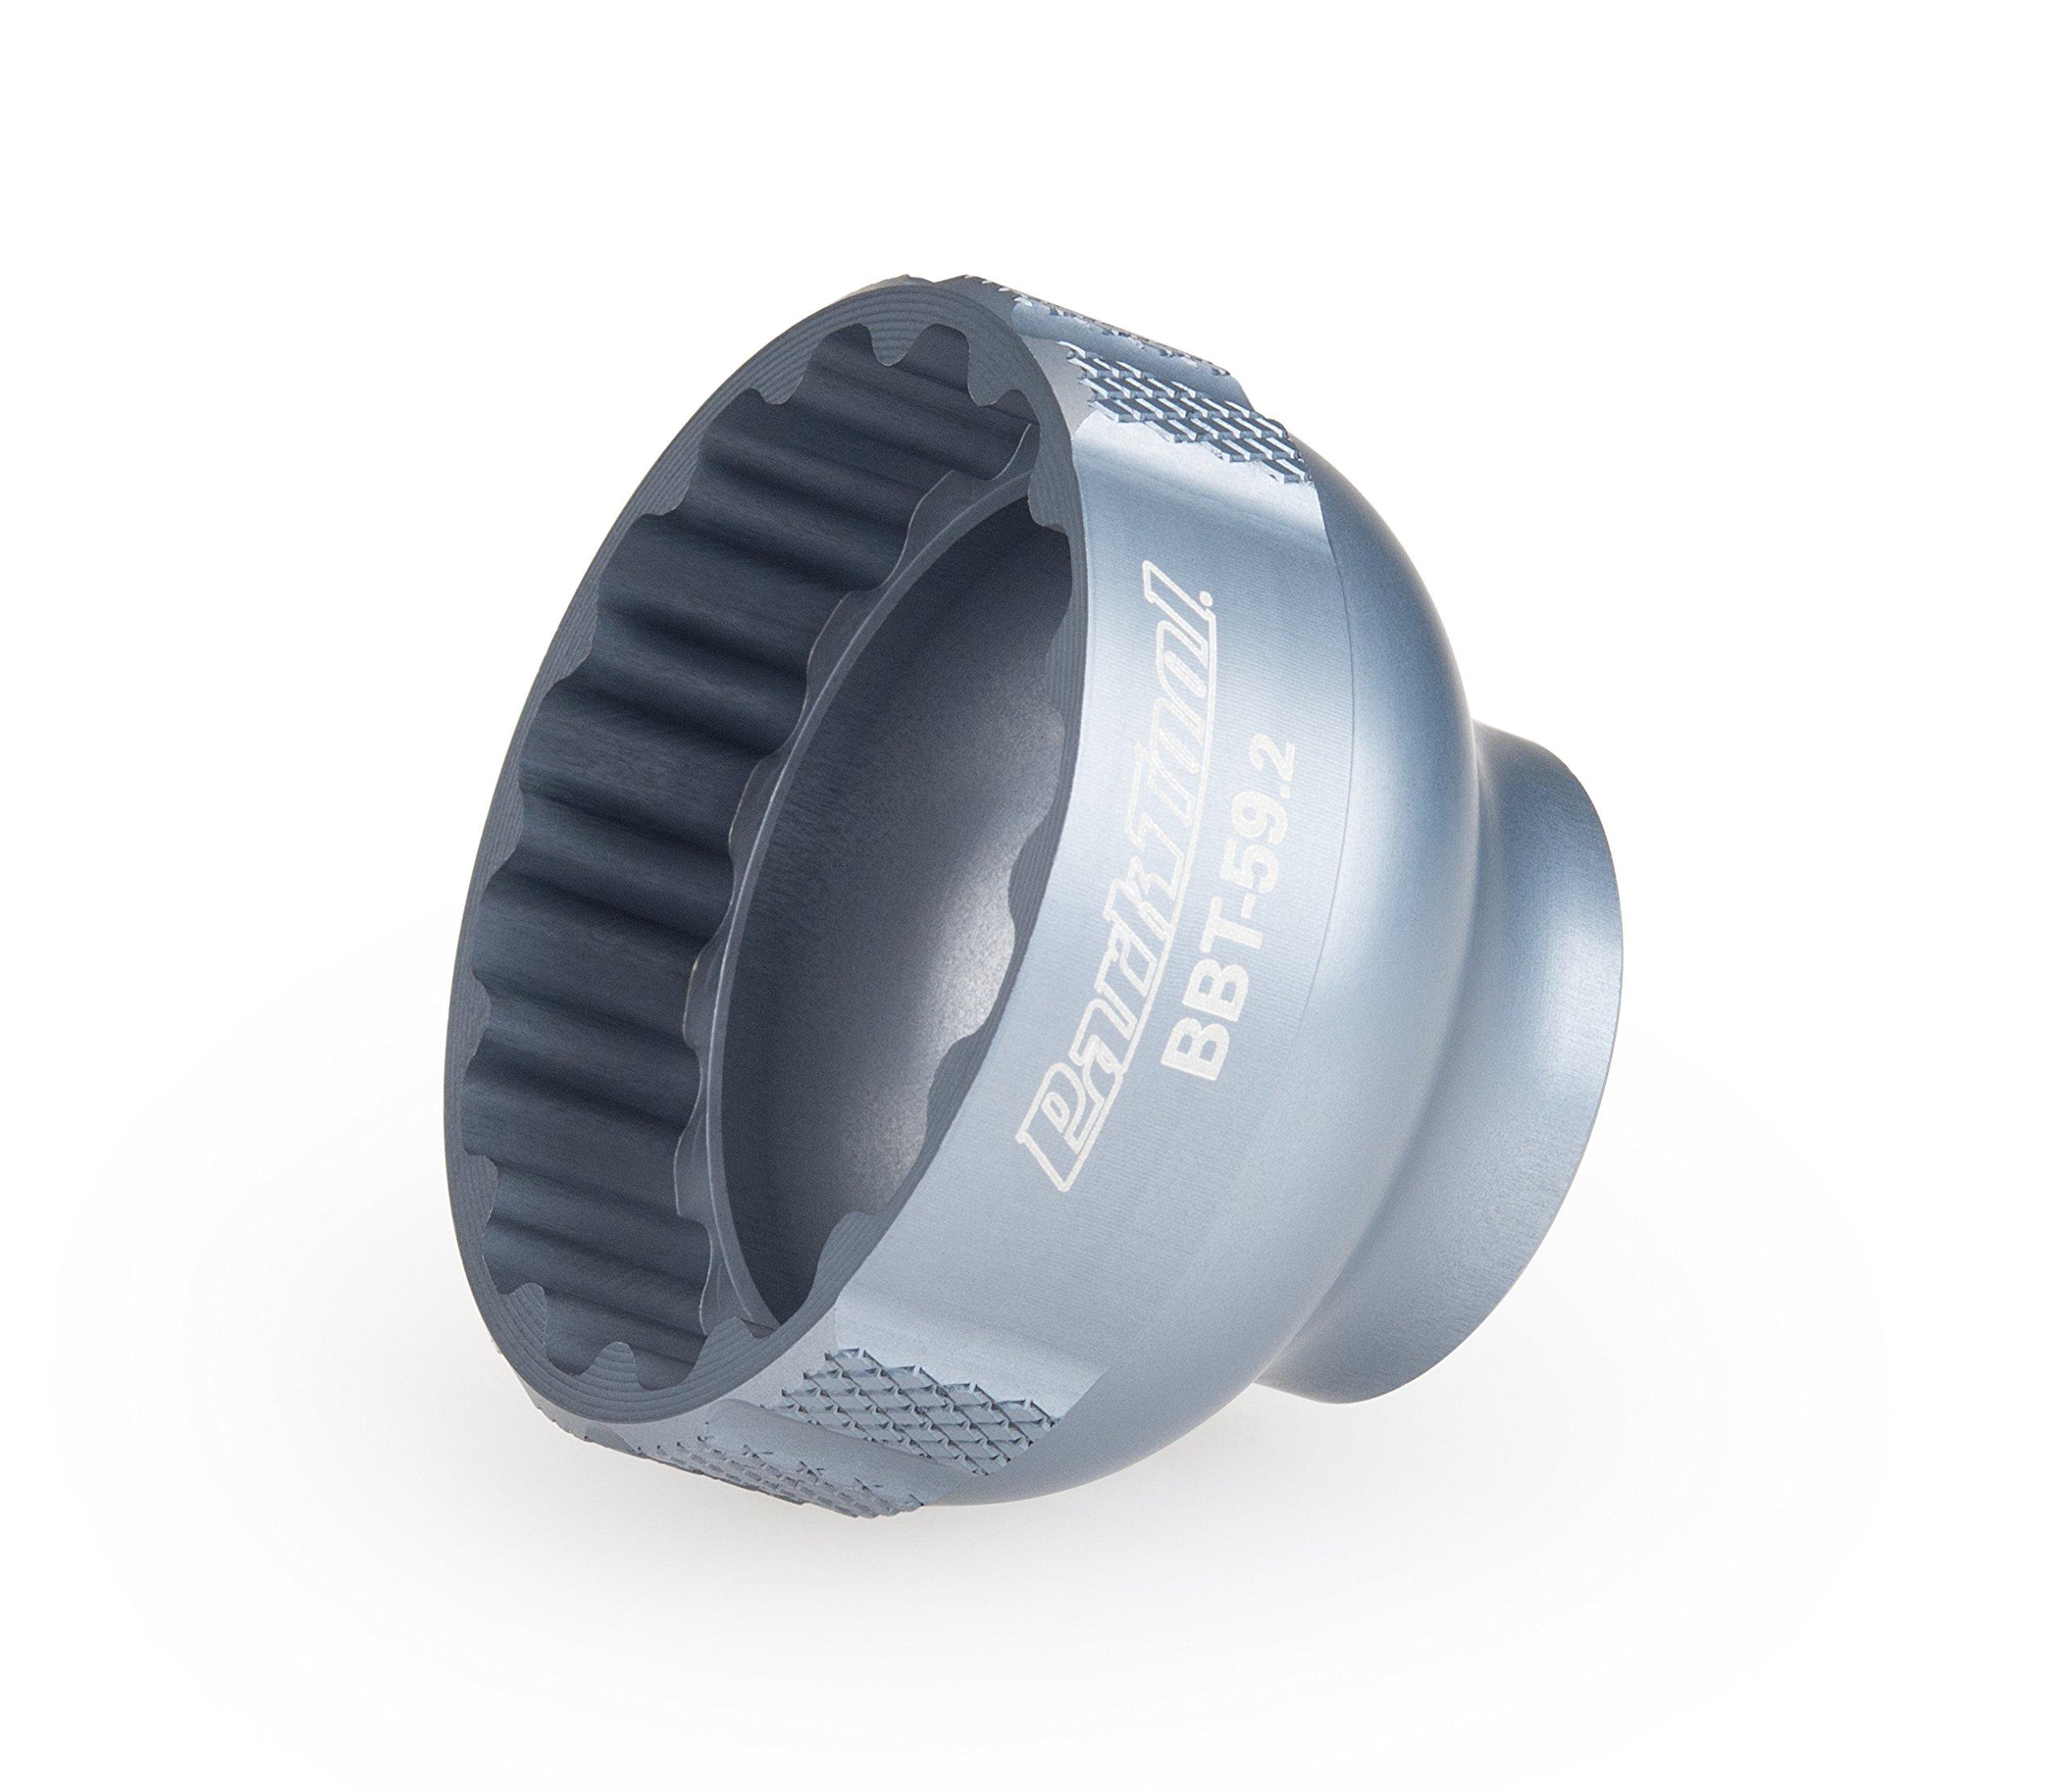 Park Tool Bottom Bracket Tool - BBT-59.2 Grey, 41mm